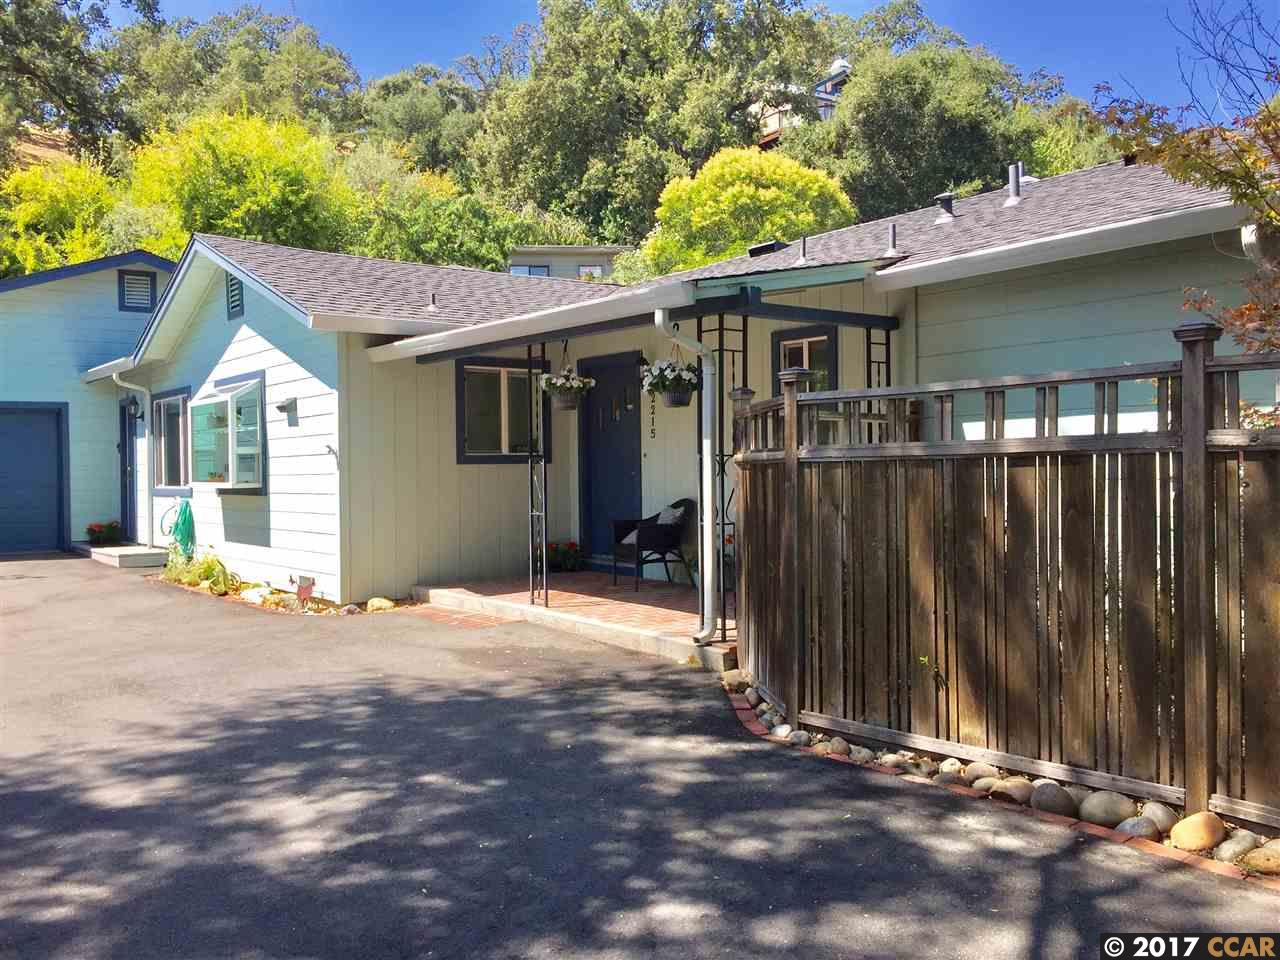 واحد منزل الأسرة للـ Sale في 2215 oakvale road 2215 oakvale road Walnut Creek, California 94597 United States